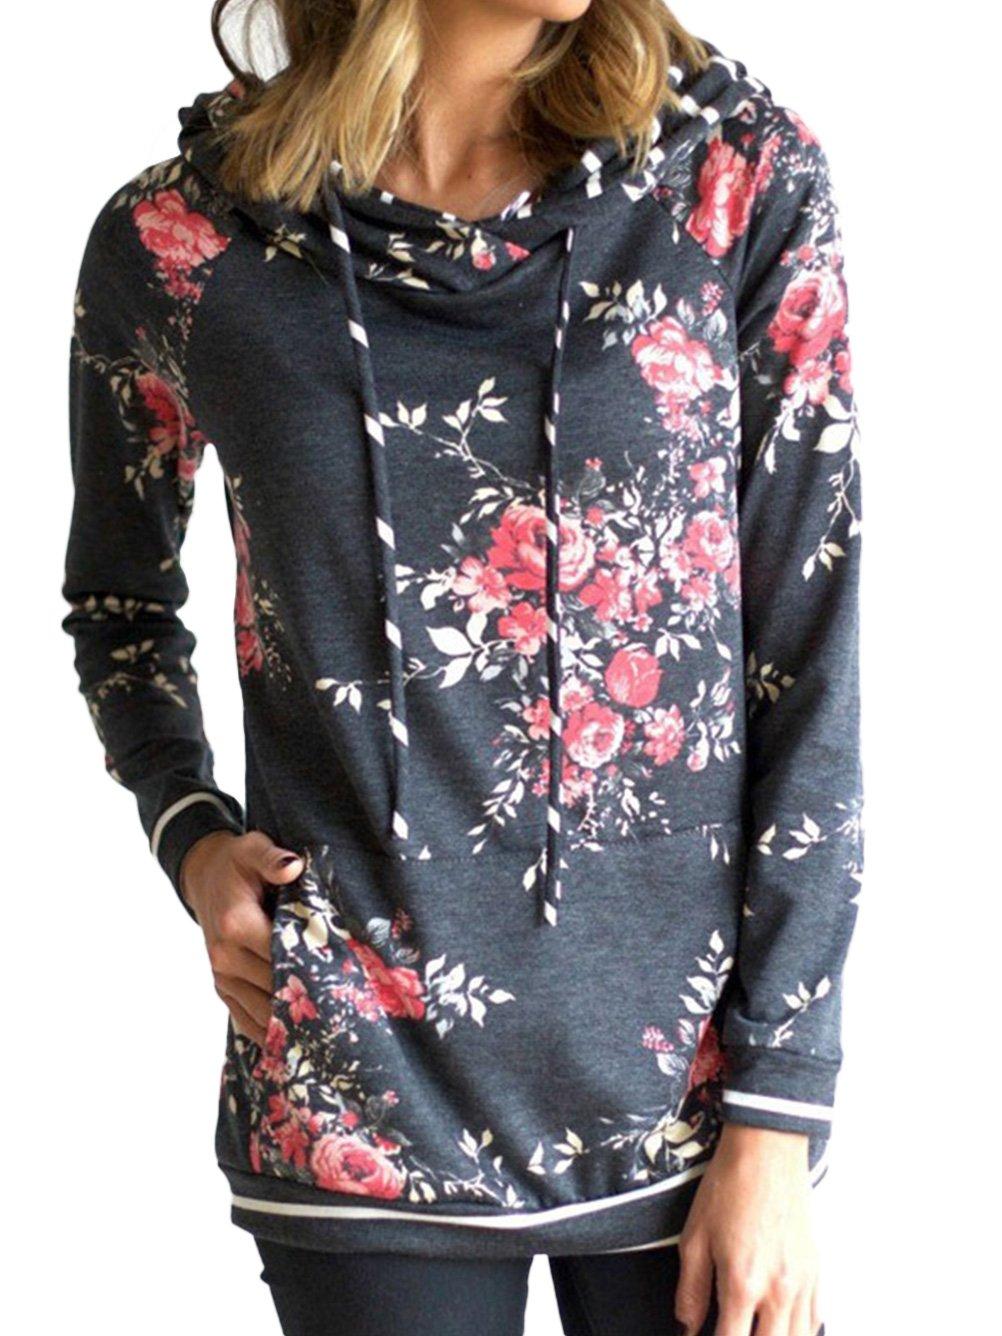 Famulily Women's Floral Printed Casual Long Sleeve Hoodie Pullover Sweatshirts (Large, Dark grey-2)